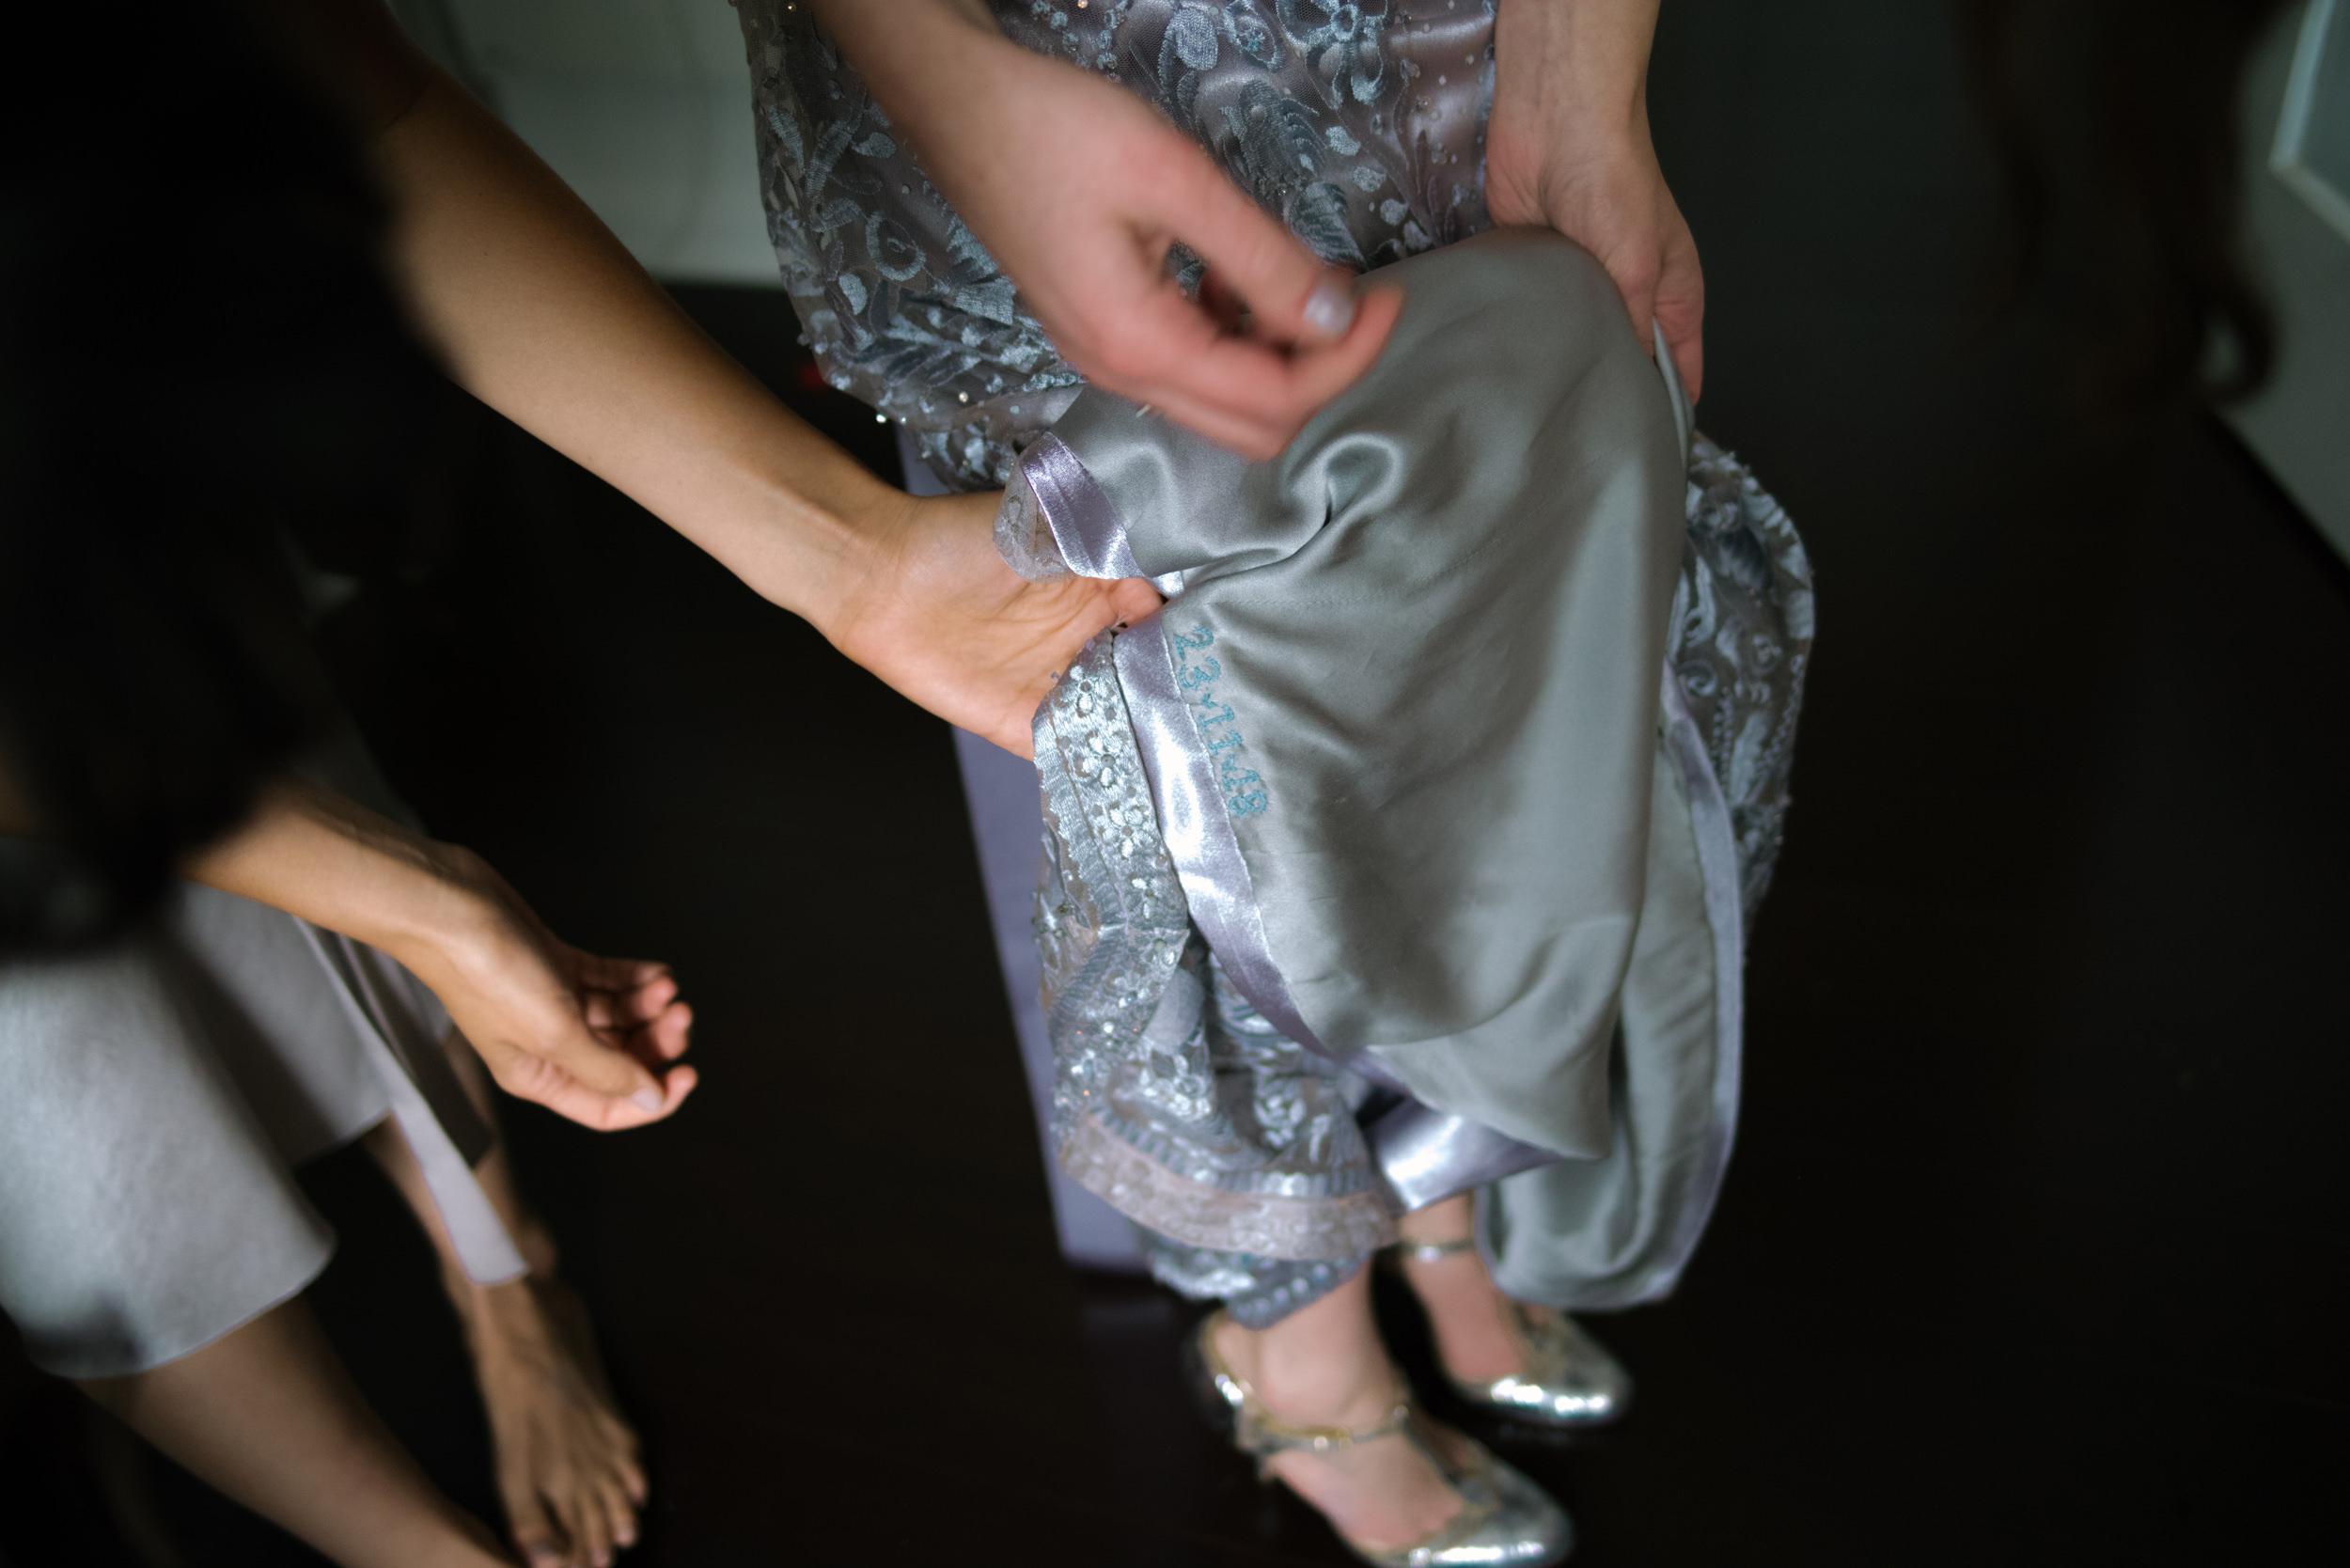 I-Got-You-Babe-&.Co.-Glasshaus-Wedding-Charlotte-Cameron0026.JPG